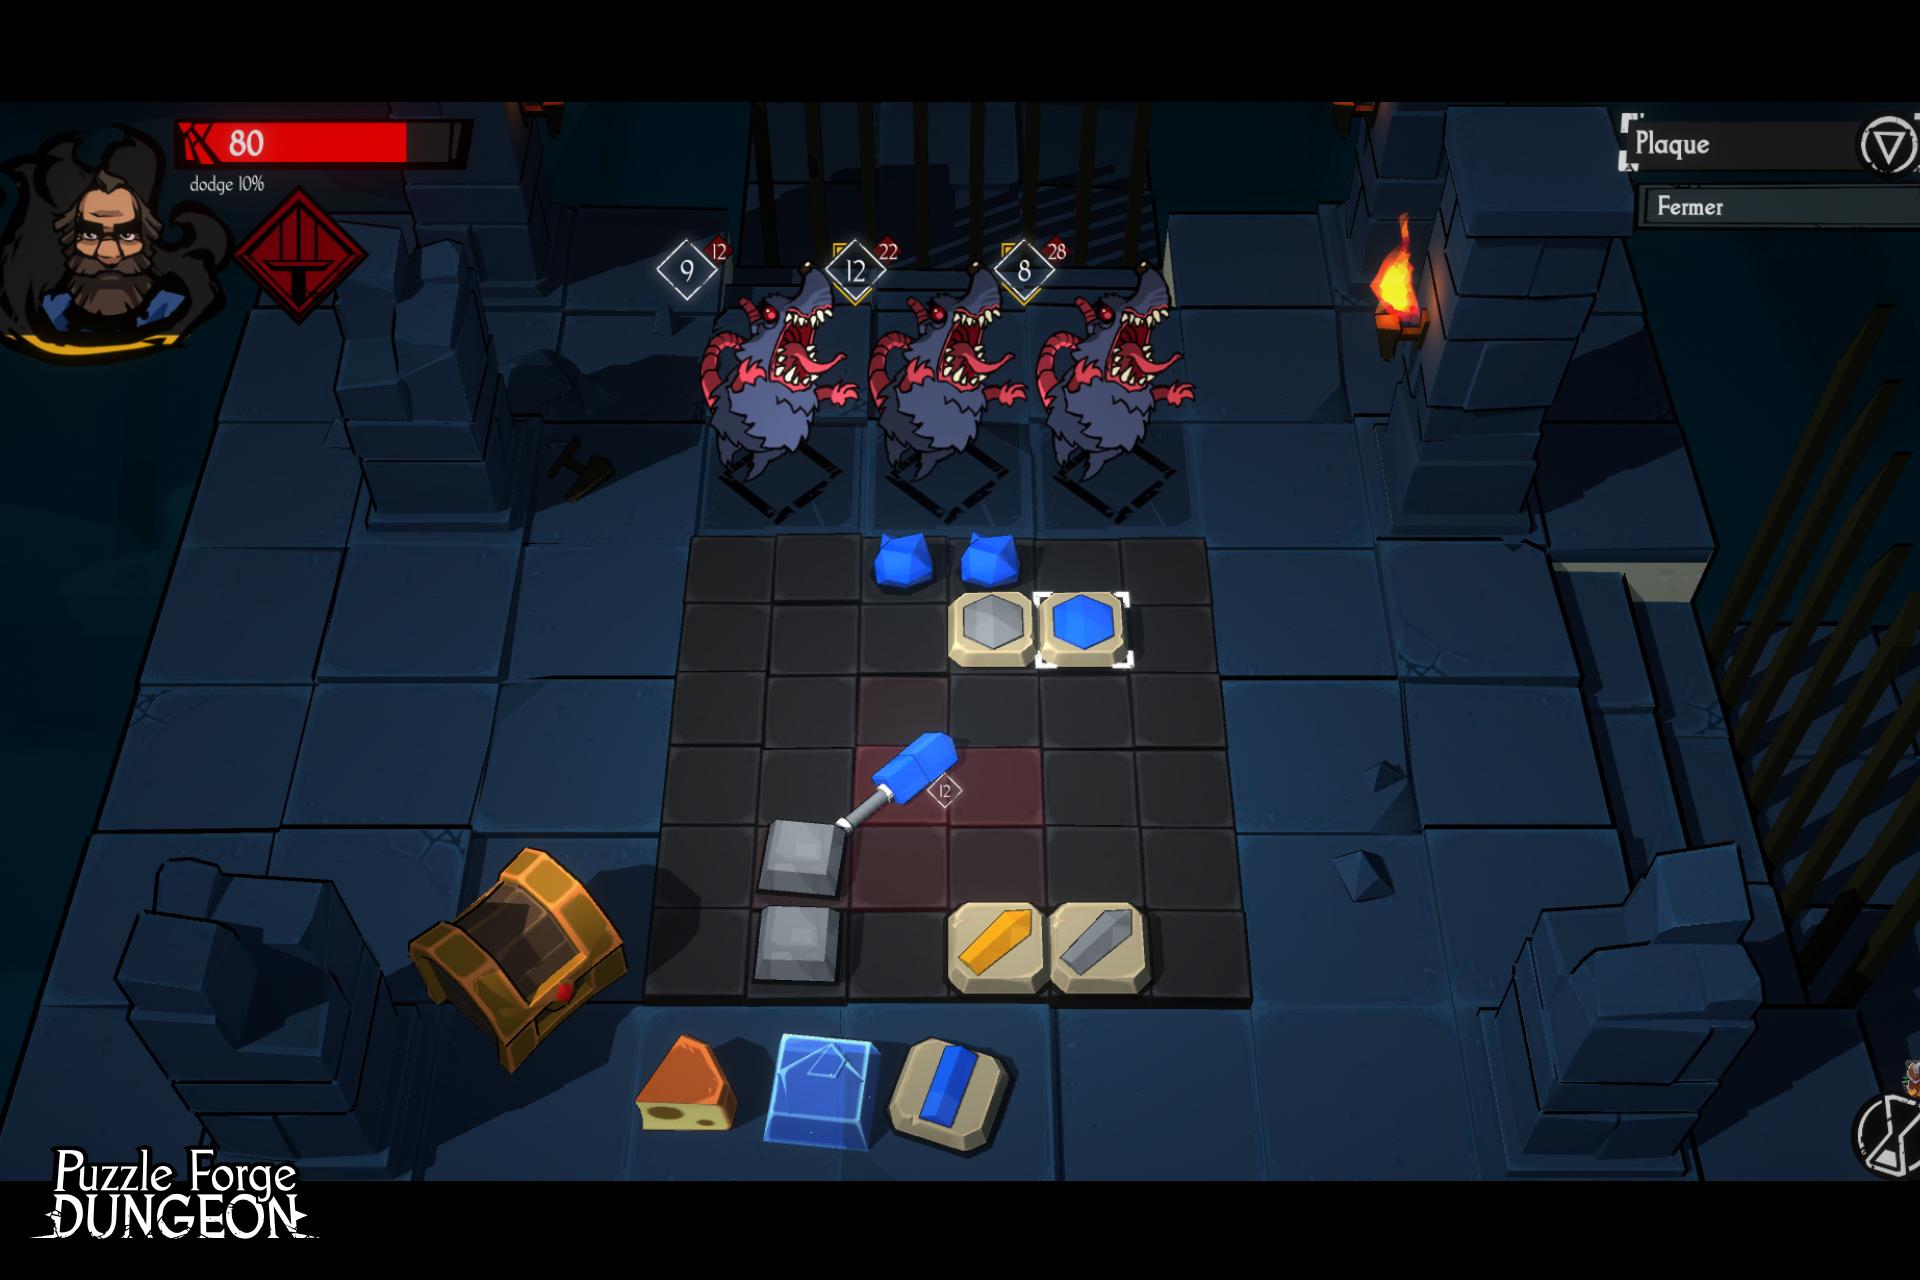 images/games/pfd/sreenshot1.jpg